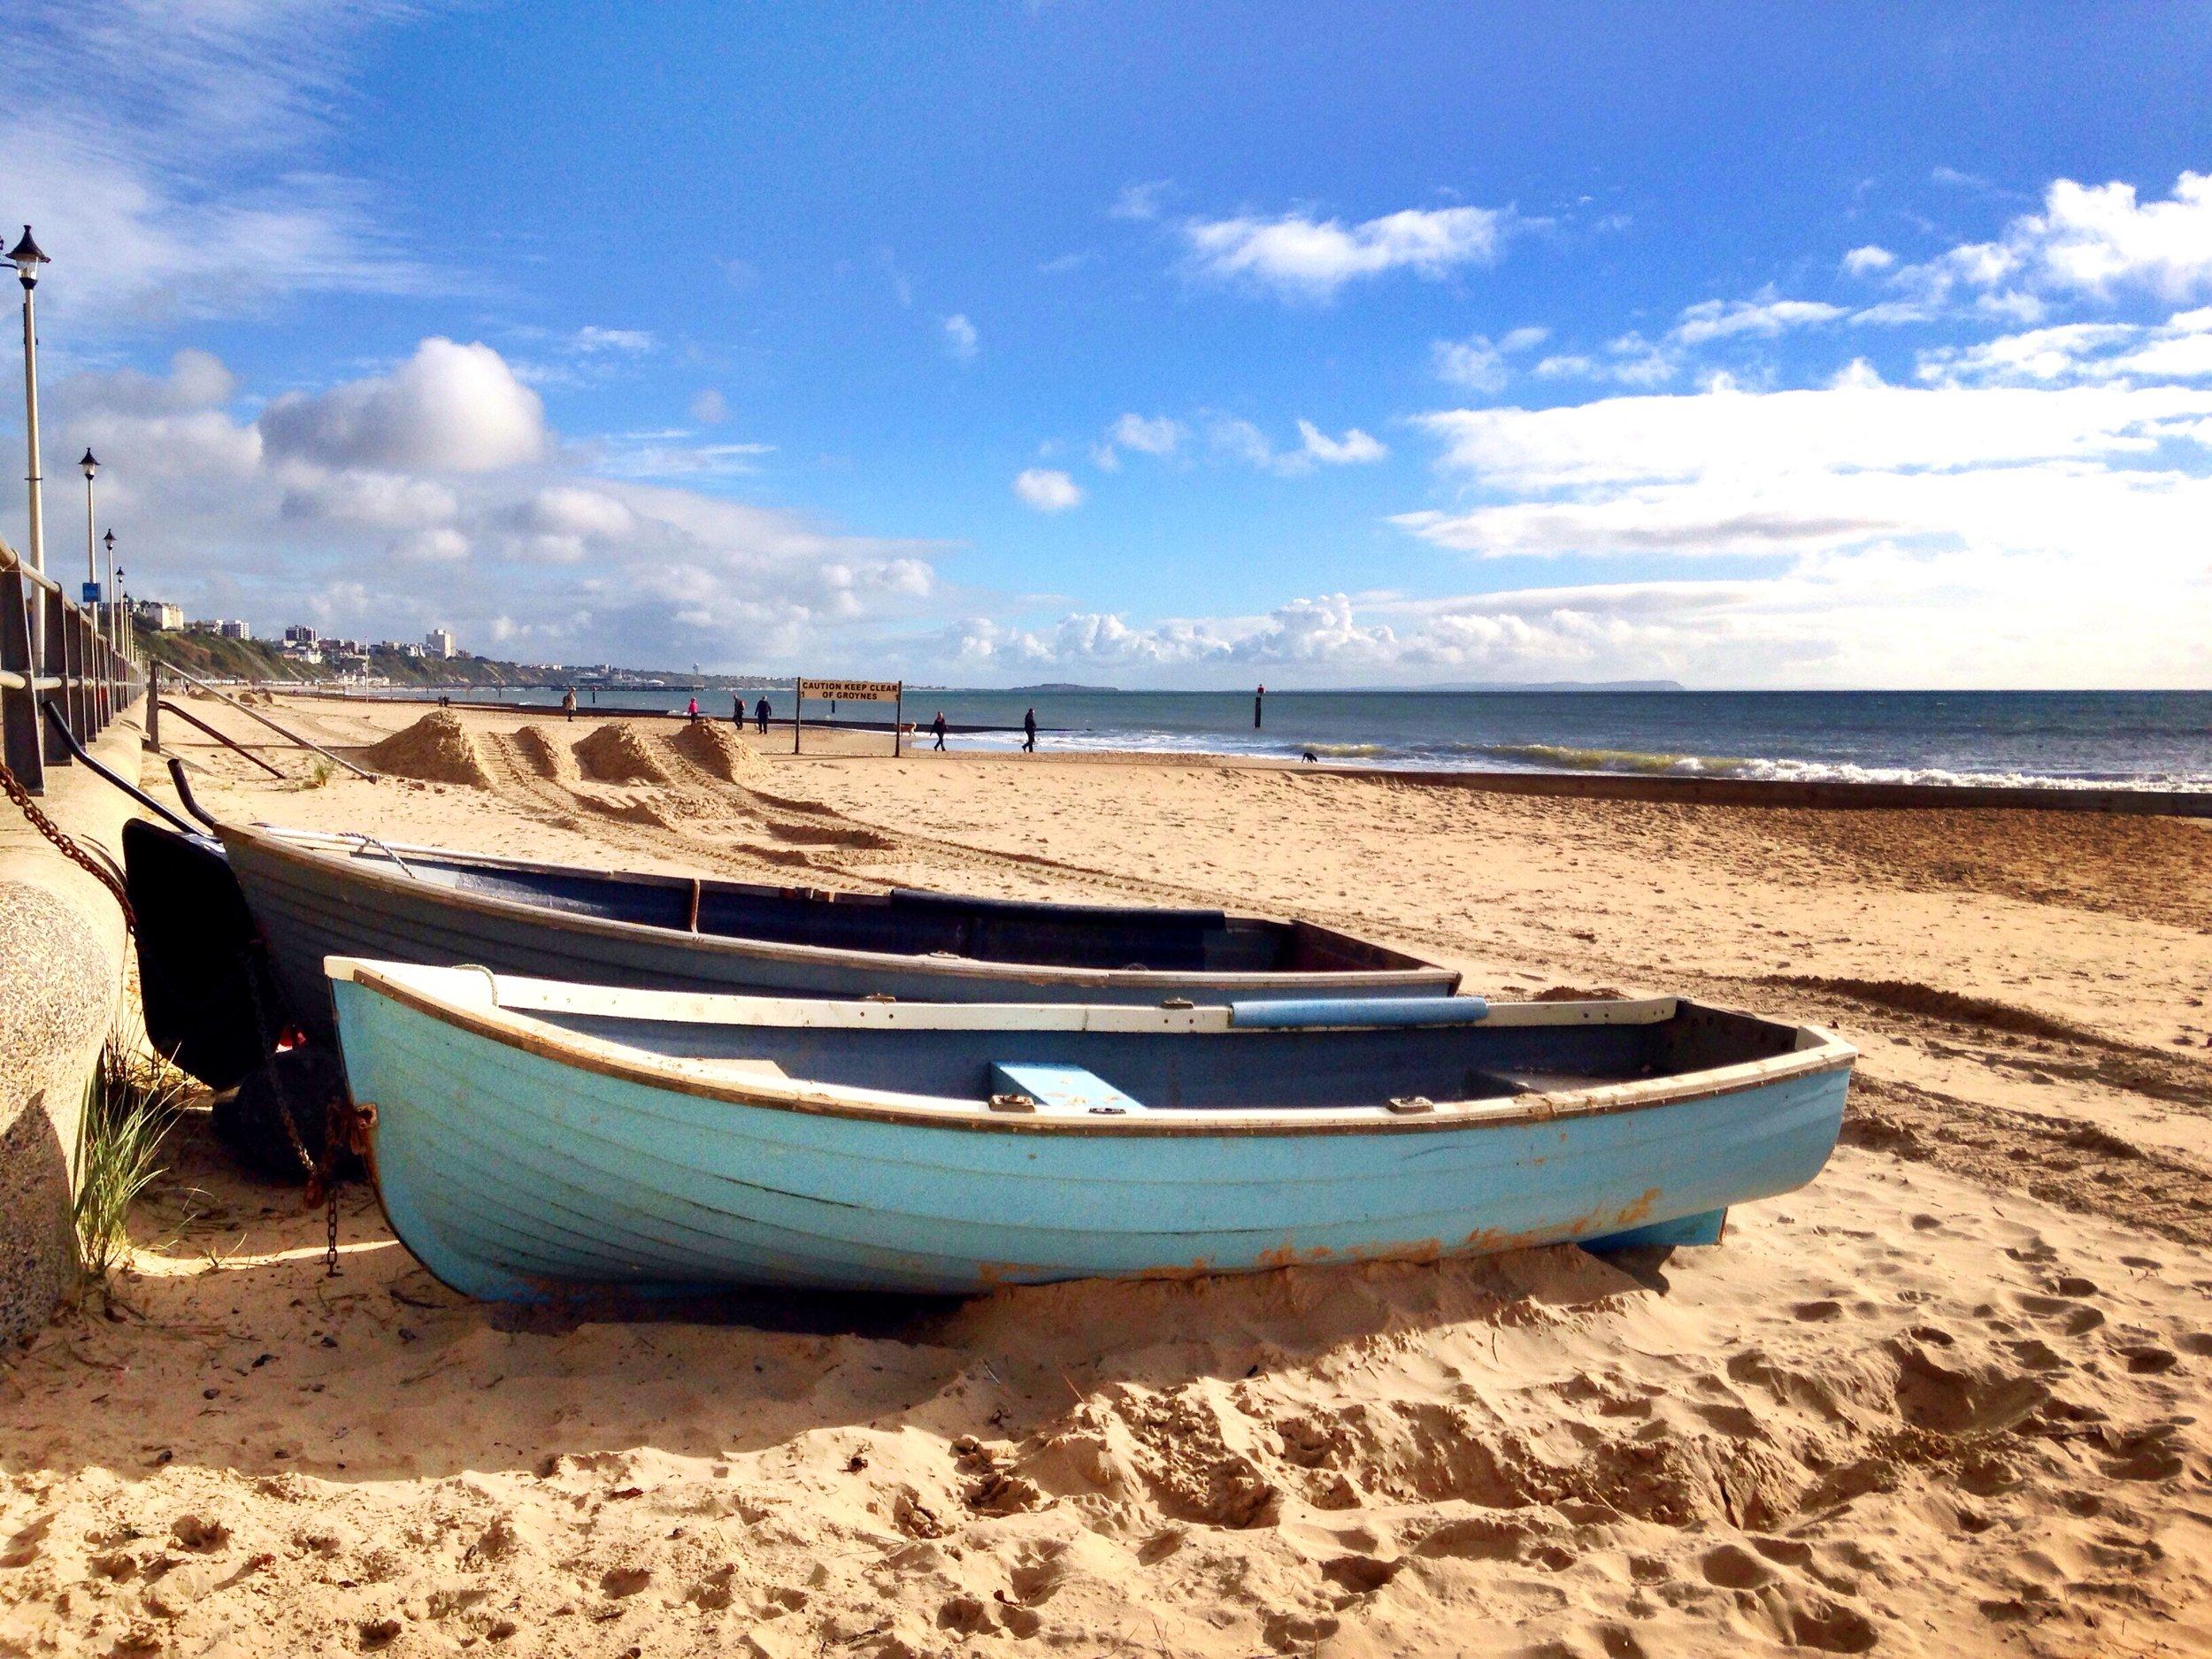 bournemouth-beach6.jpg